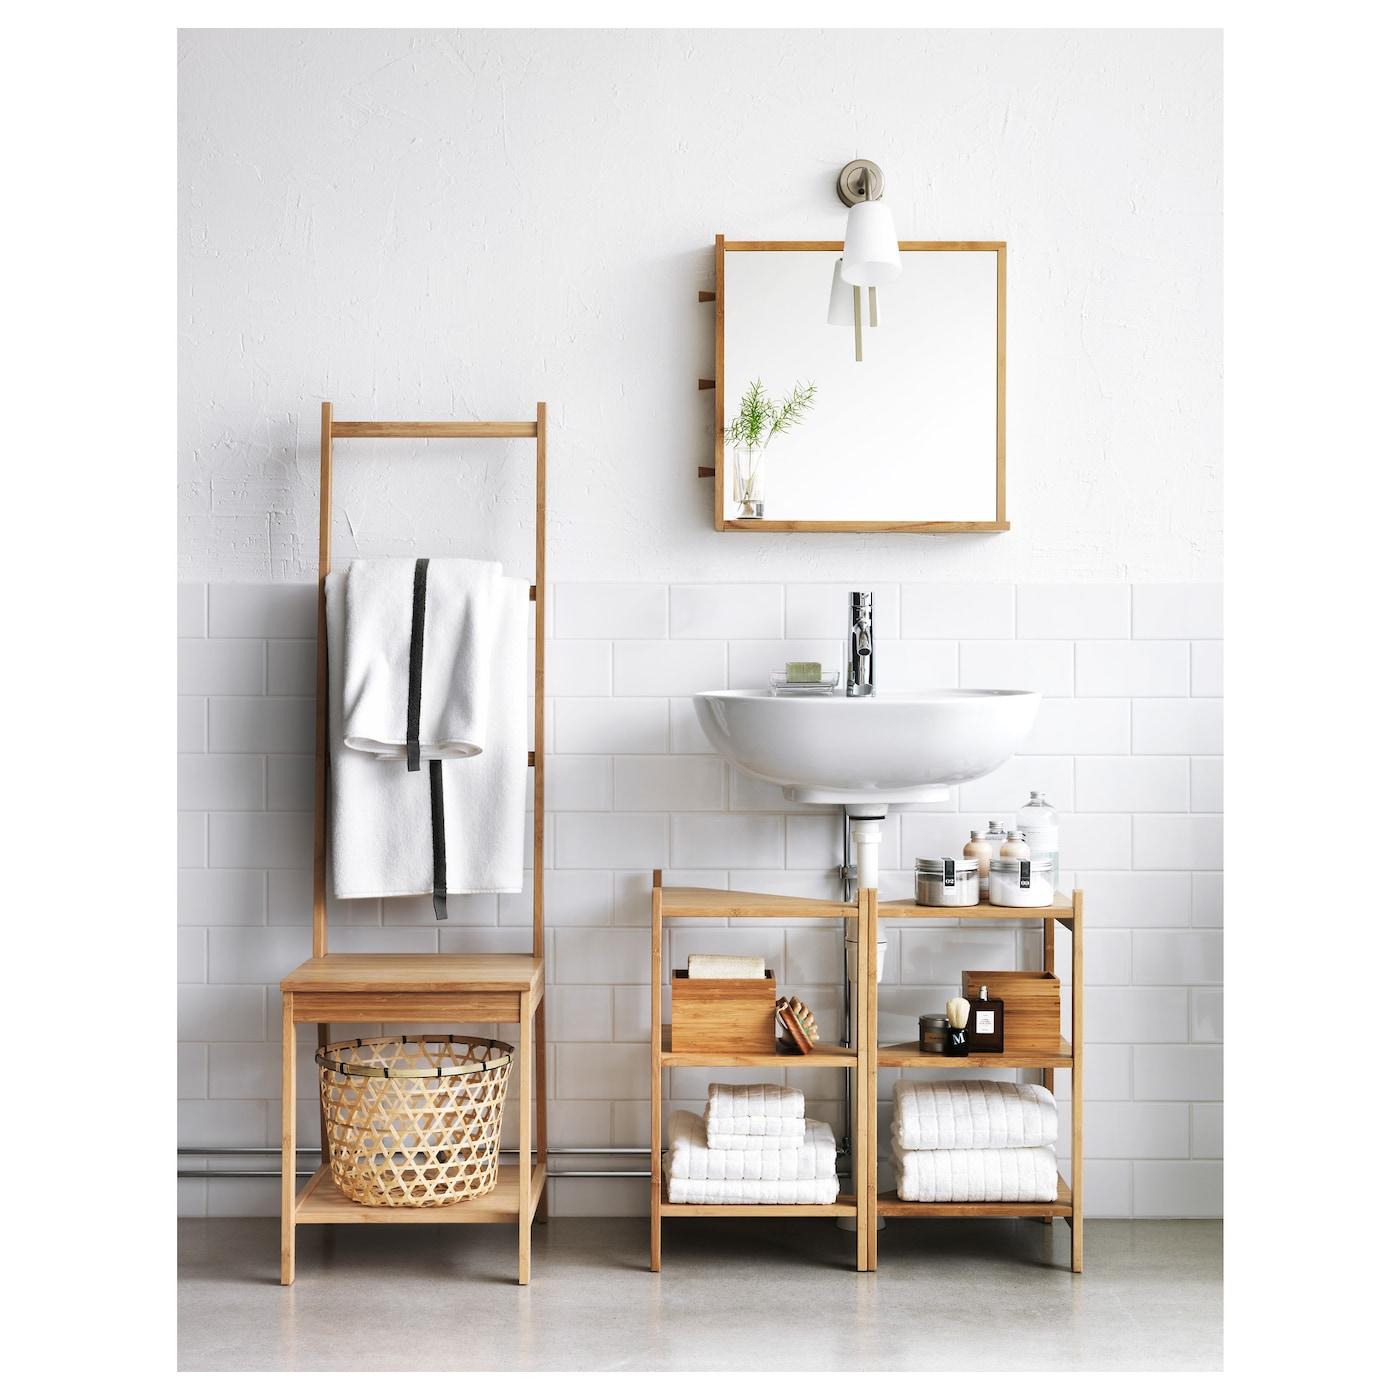 R grund wash basin corner shelf bamboo 34x60 cm ikea - Ikea rangement tiroir salle de bain ...